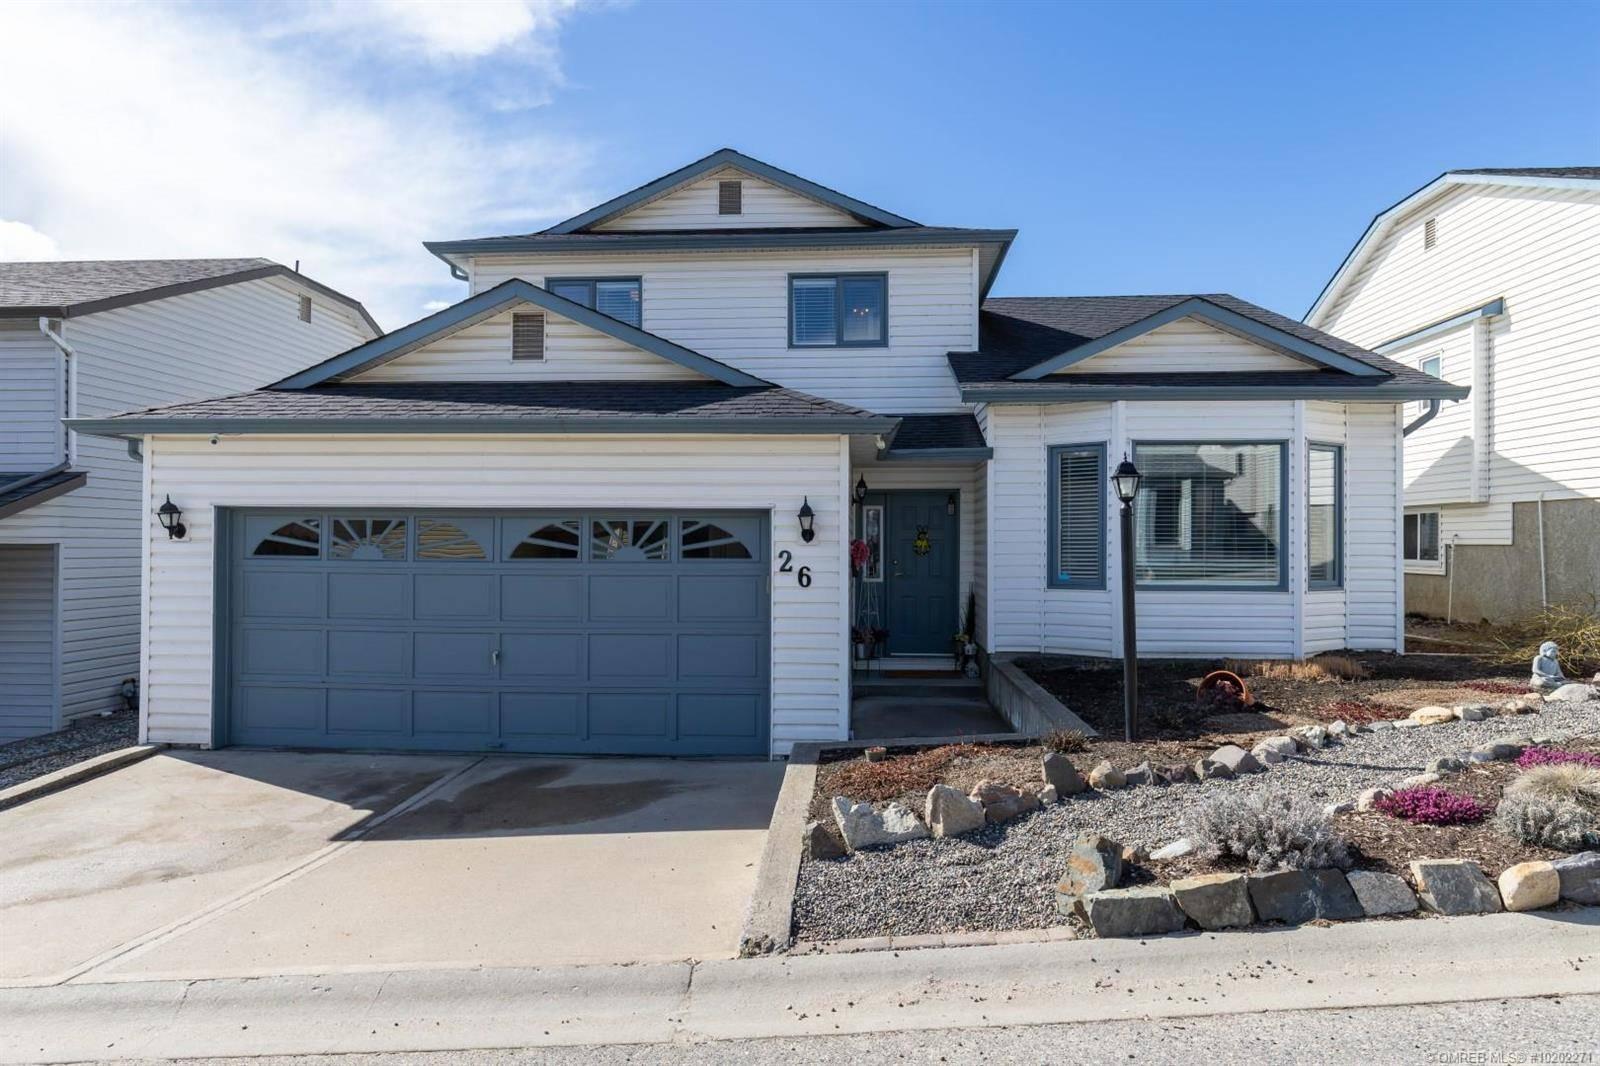 House for sale at 555 Glenmeadows Rd Unit 26 Kelowna British Columbia - MLS: 10202271